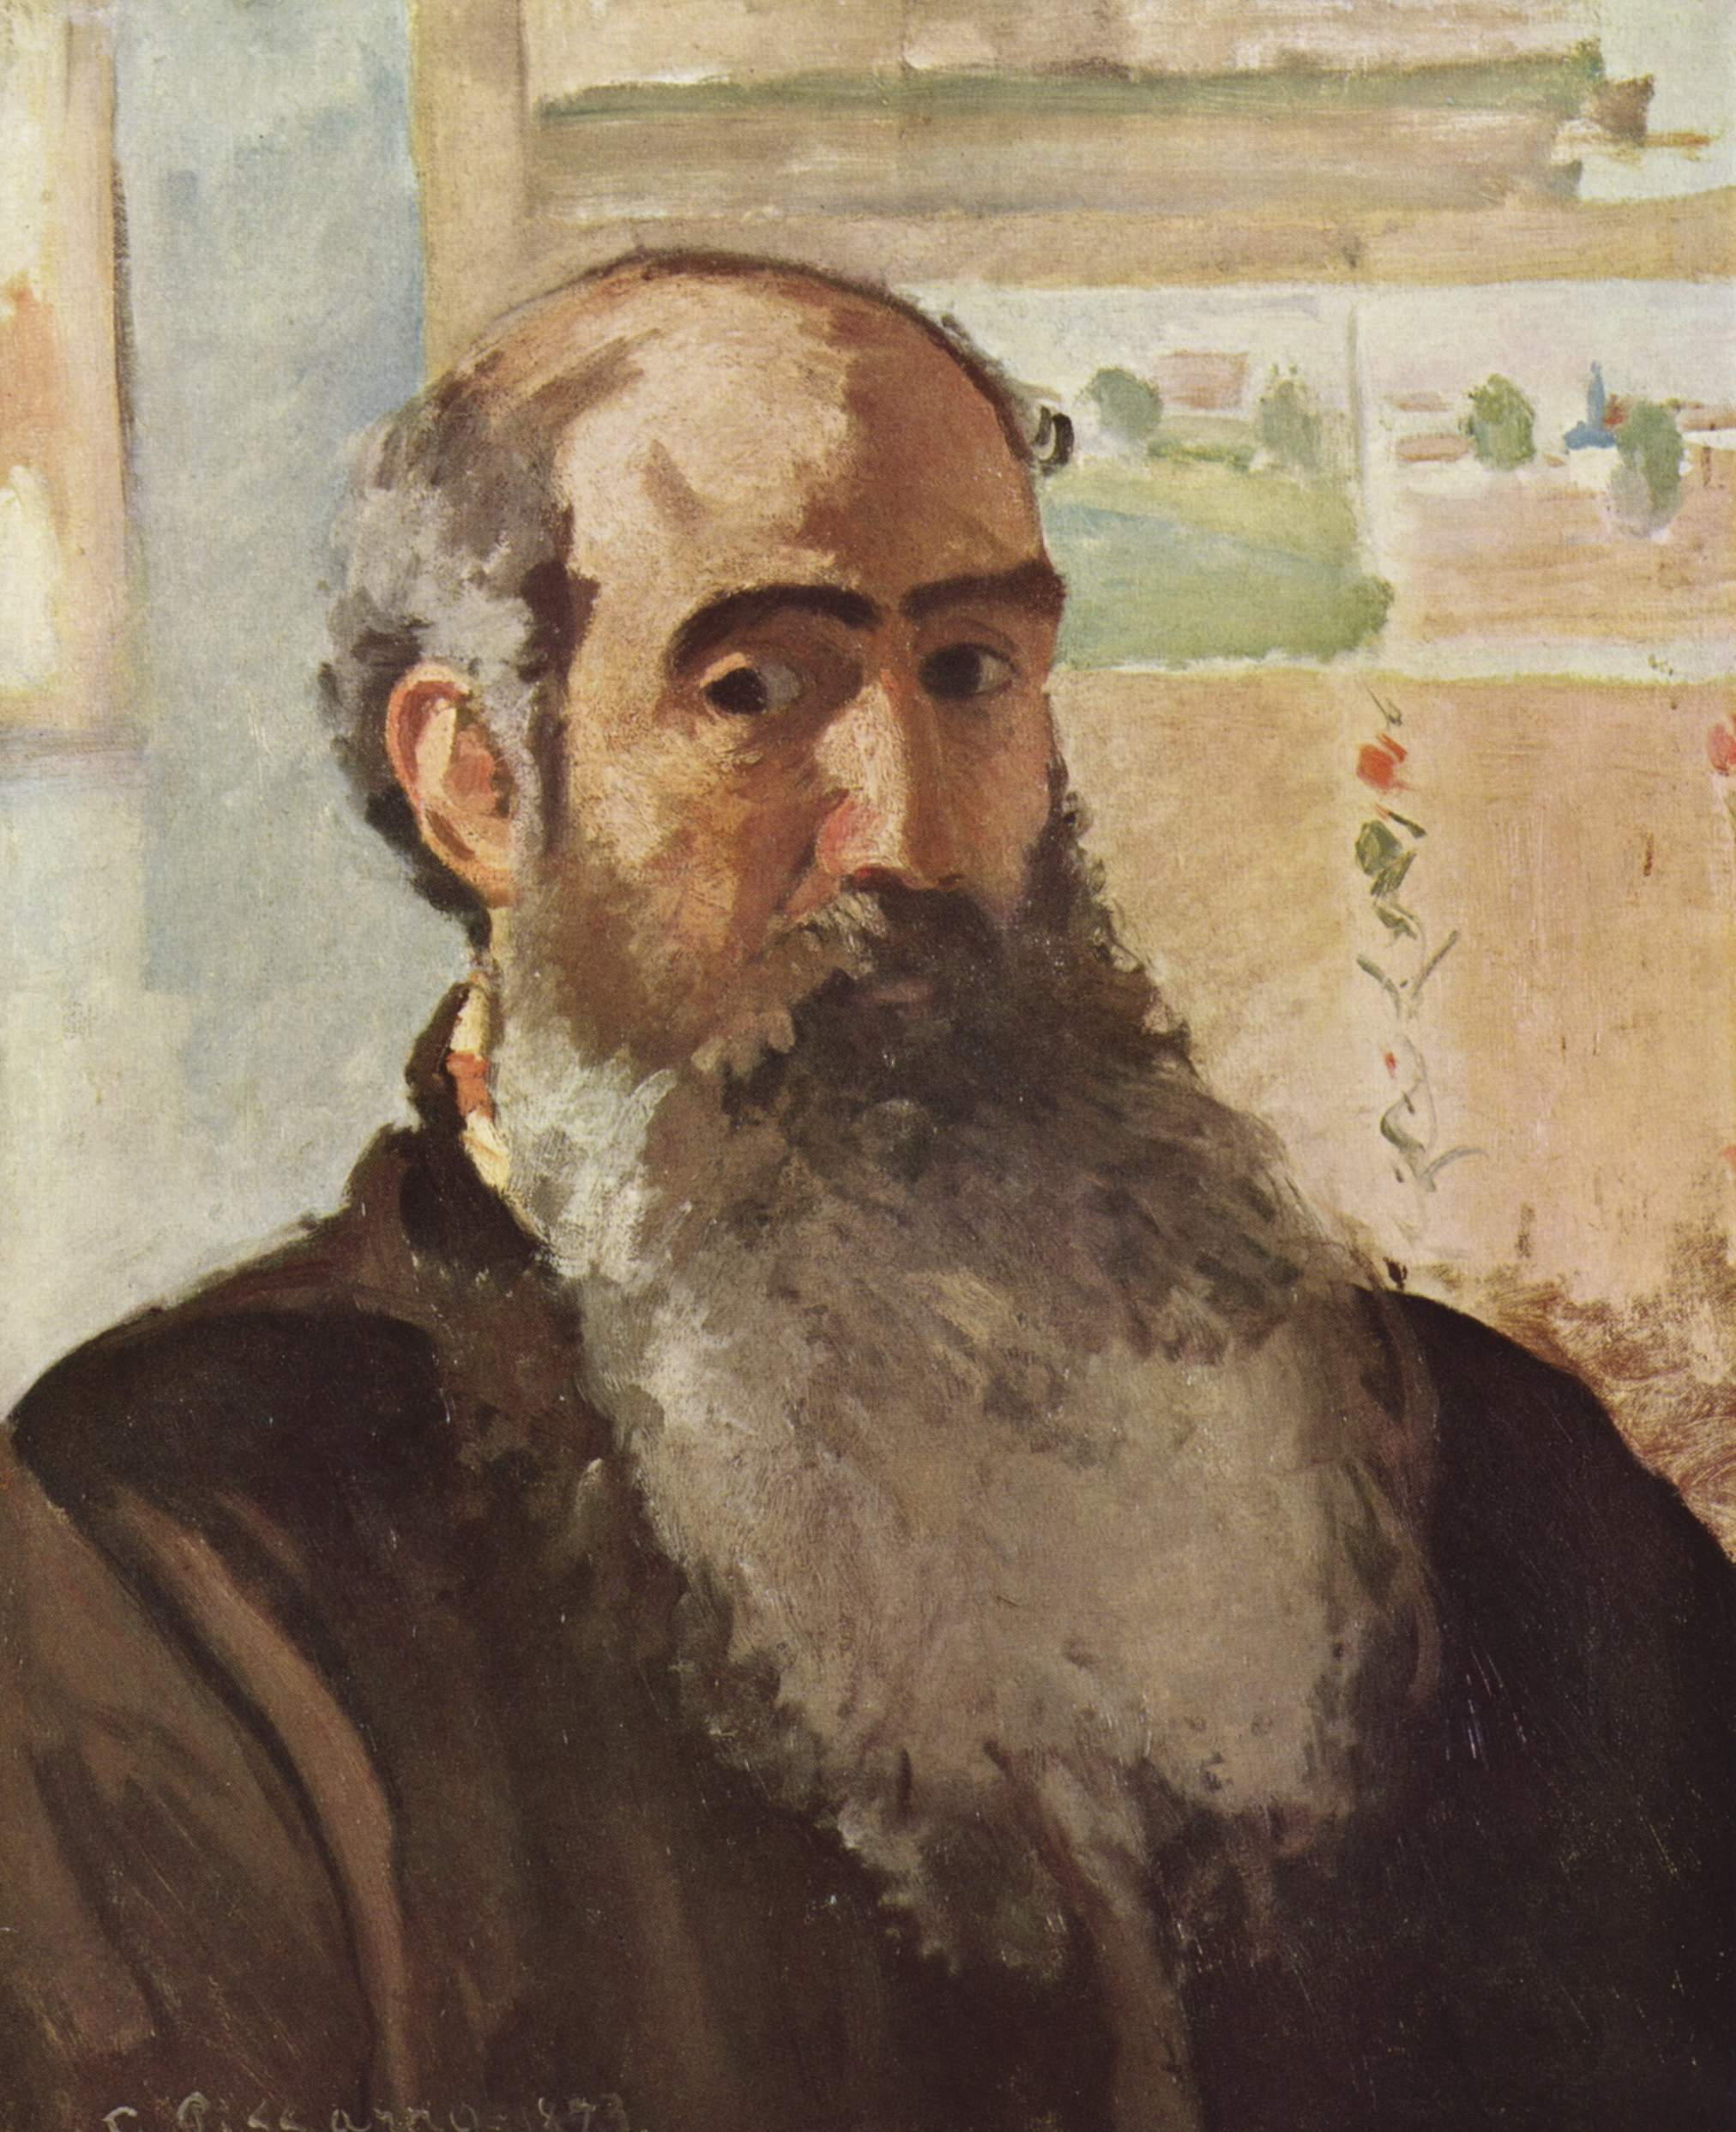 Bust-Length portrait: Camille Pissarro, Artist